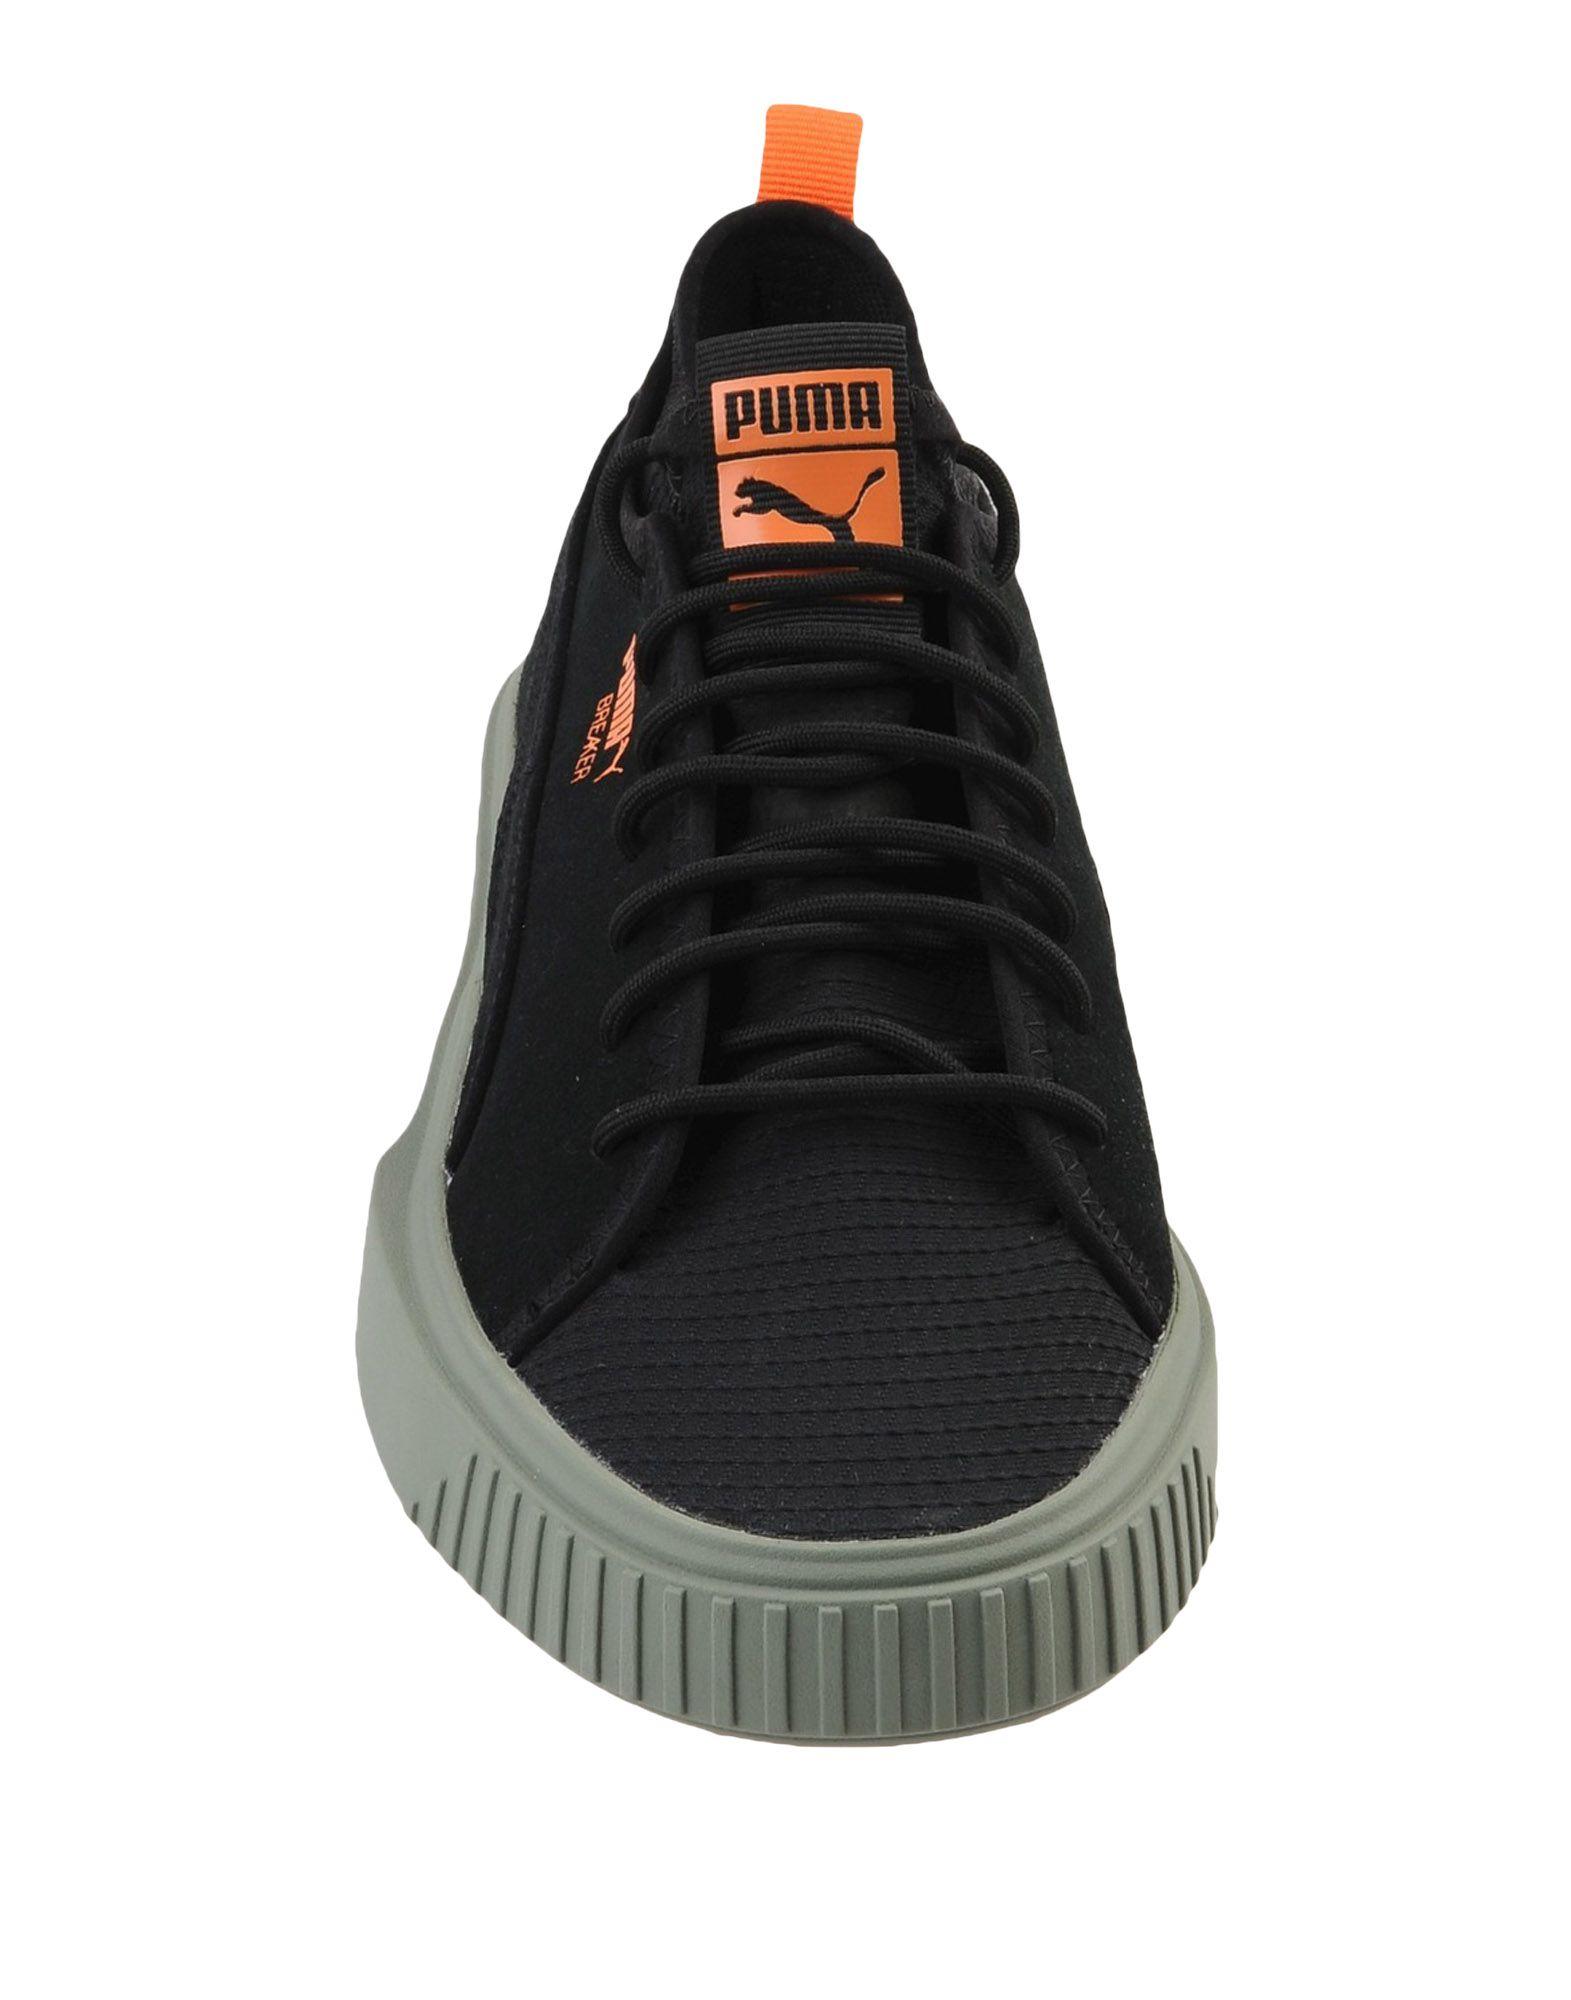 Puma Puma Breaker Mesh Mesh Mesh - Sneakers - Men Puma Sneakers online on  Australia - 11567187AG 29e59b